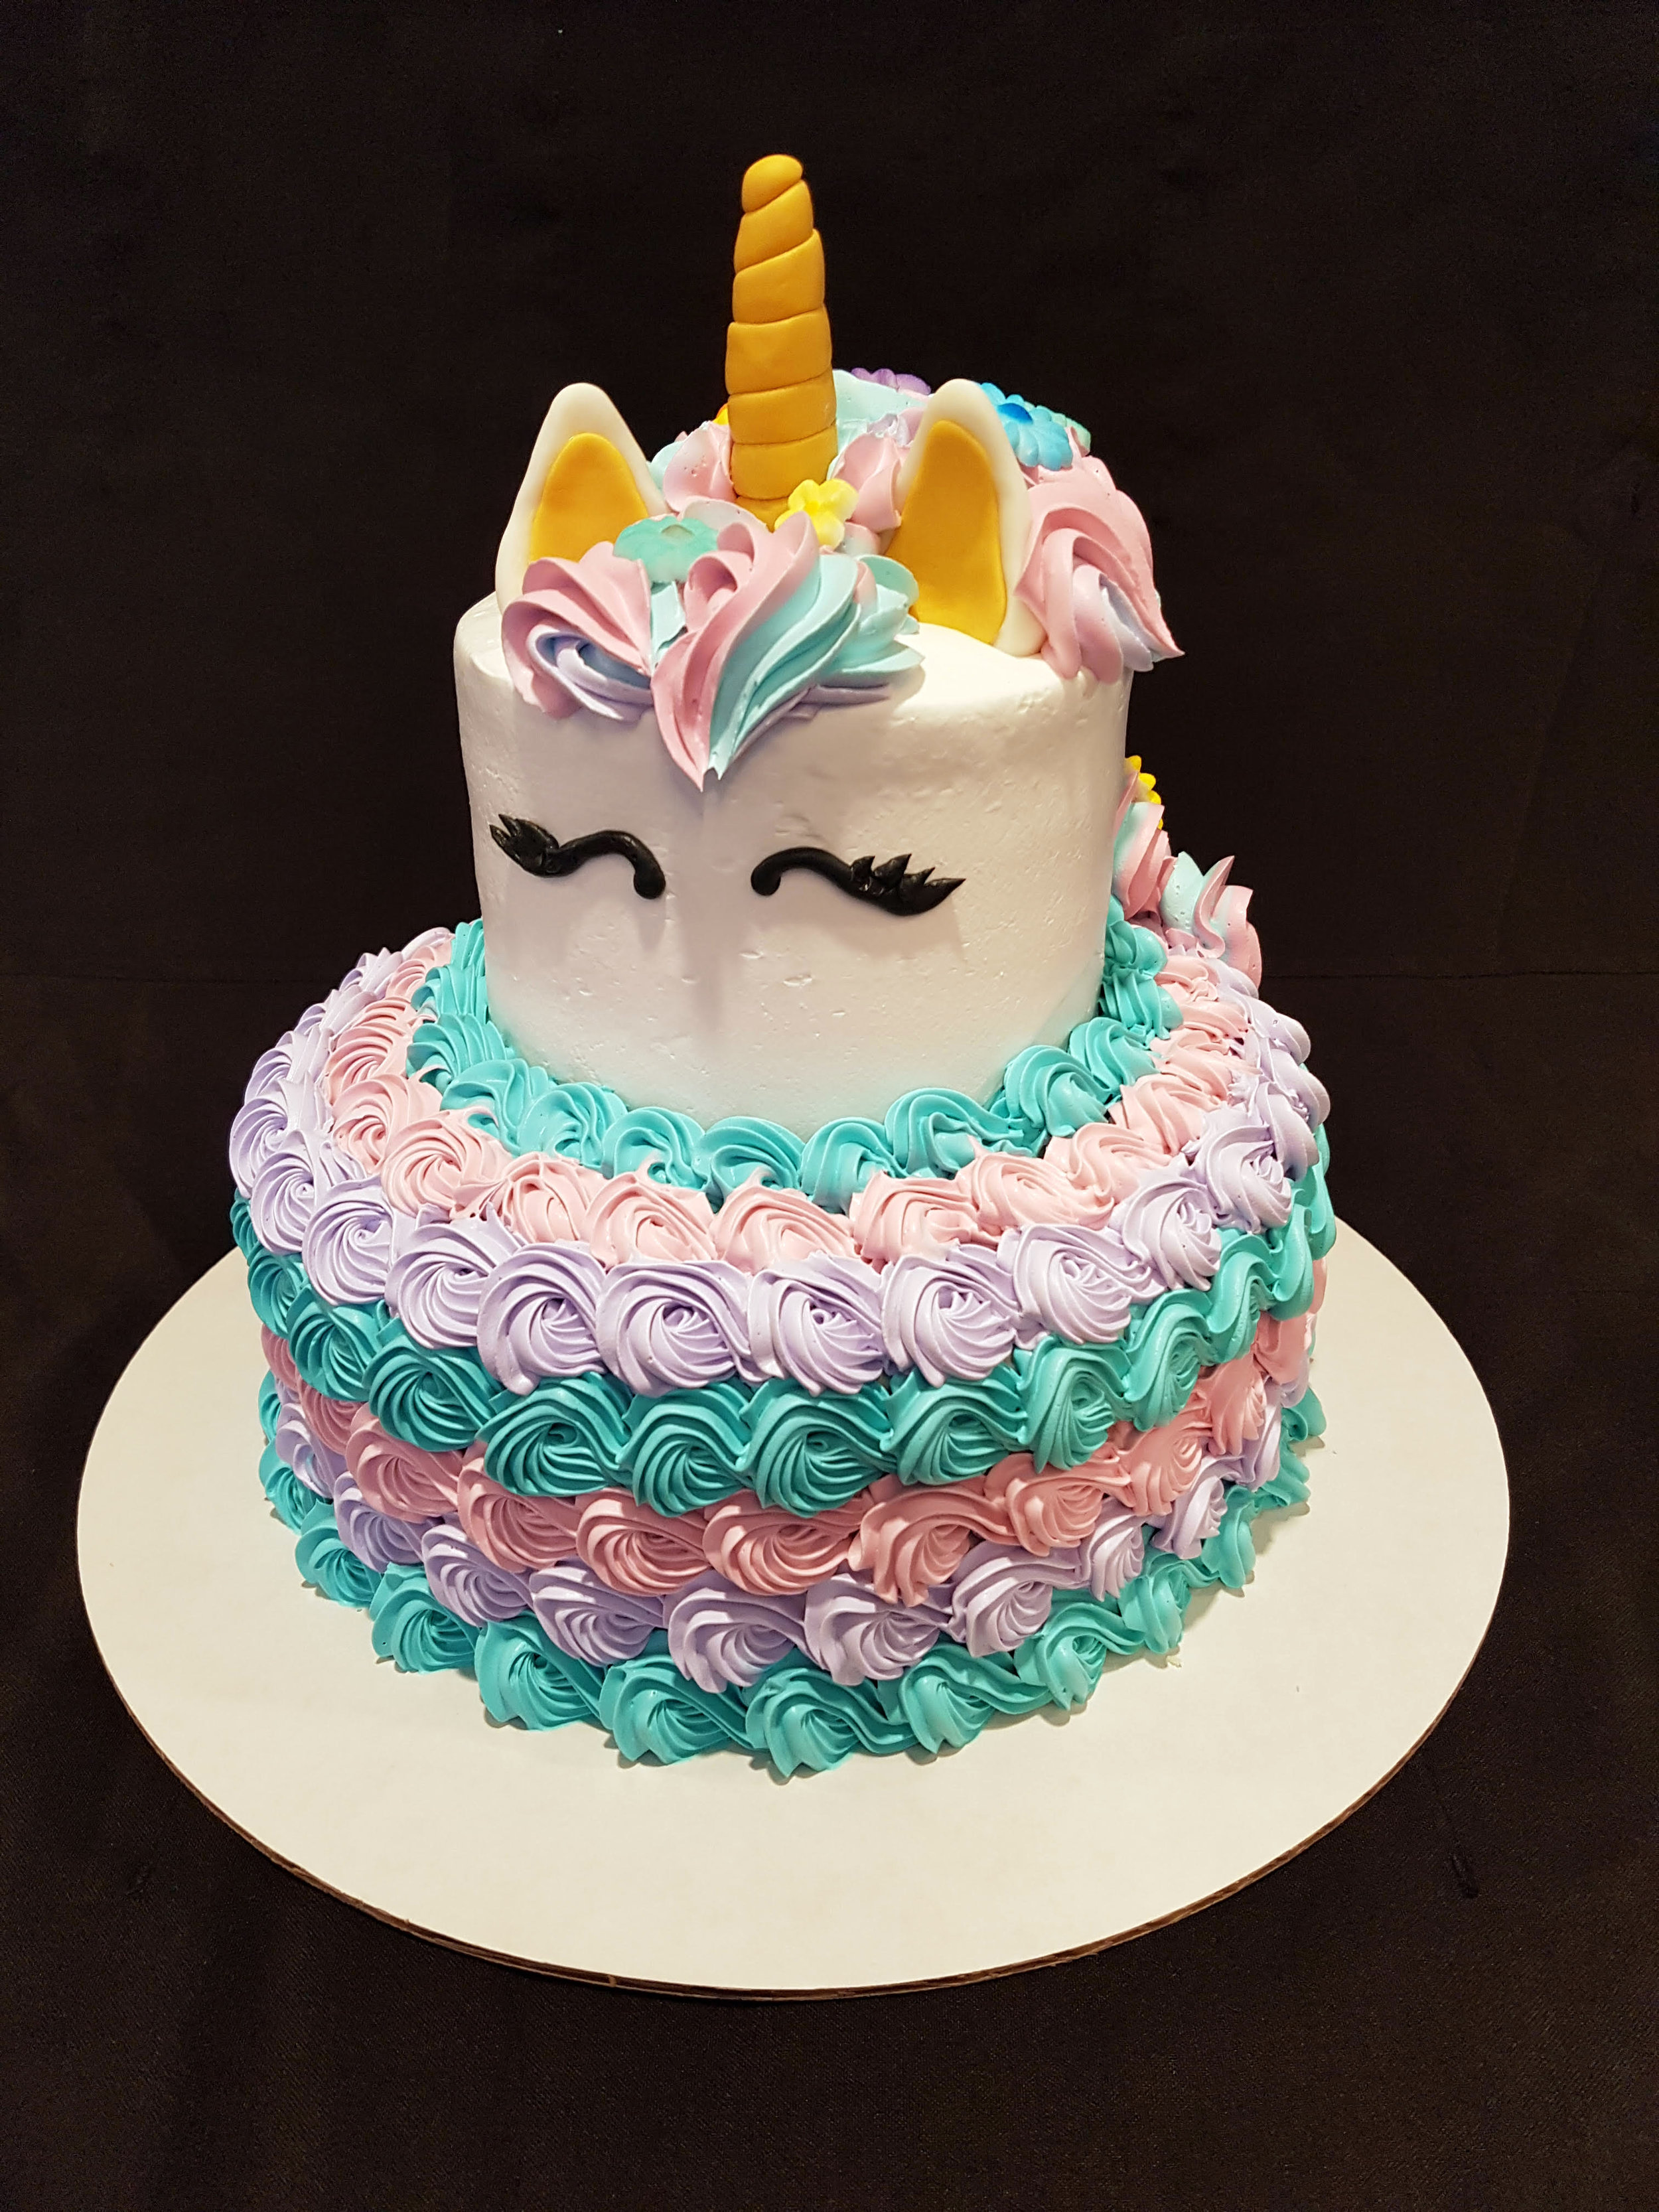 Askews_Cake_unicorn.jpg